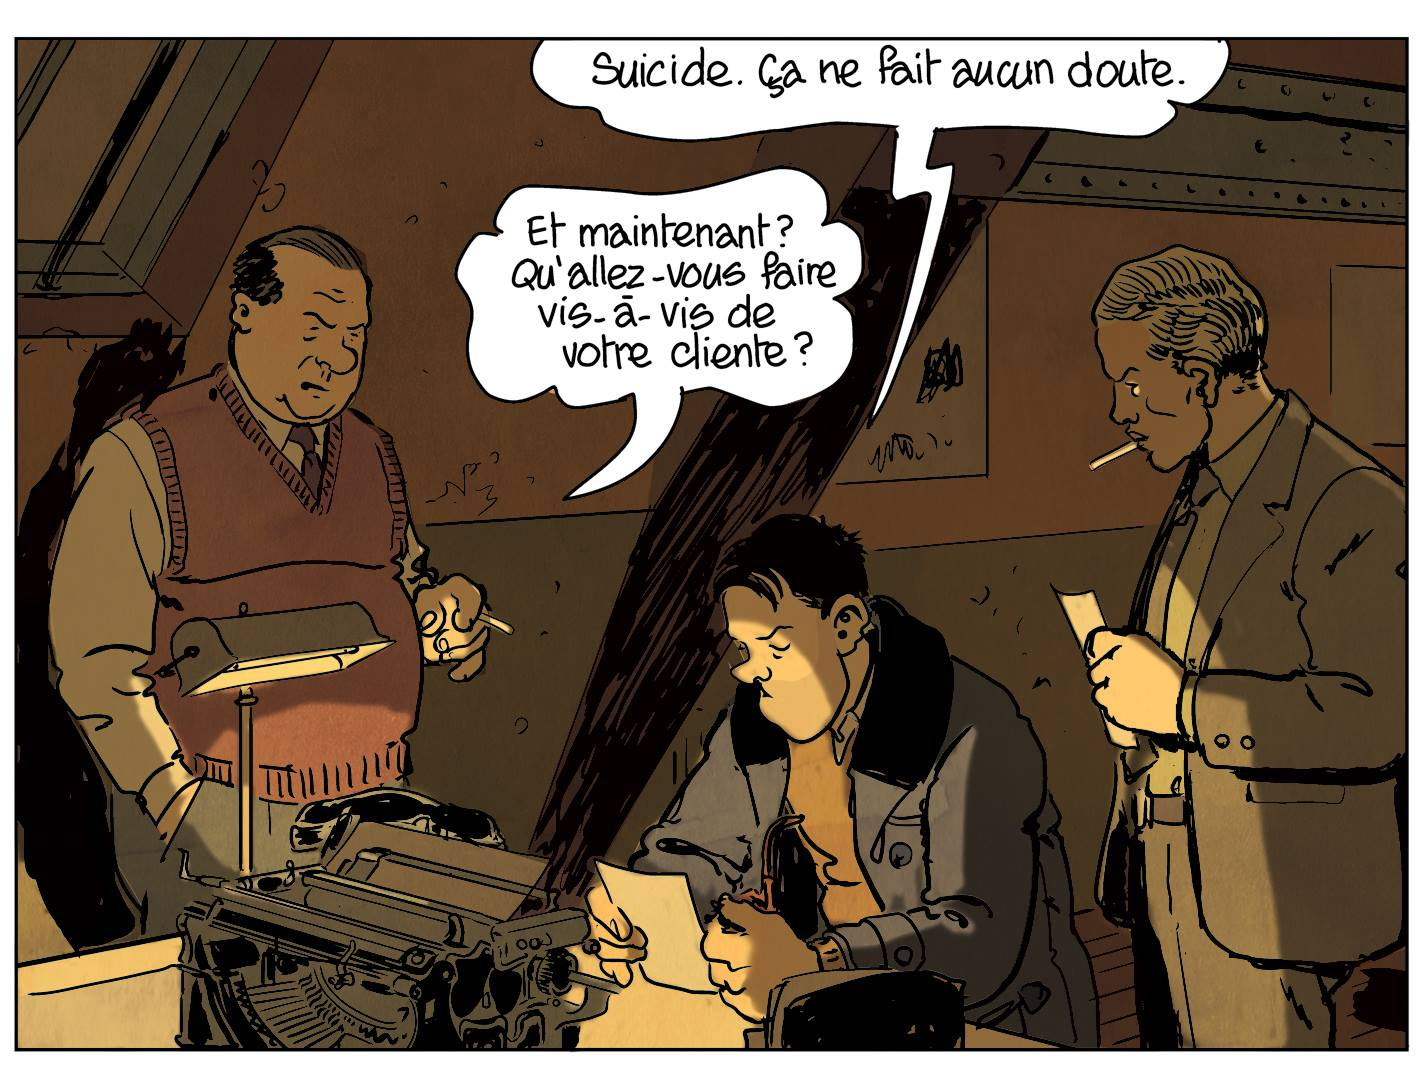 Nestor Burma - BD - Barral - Micmac moche au boul'mich - suicide